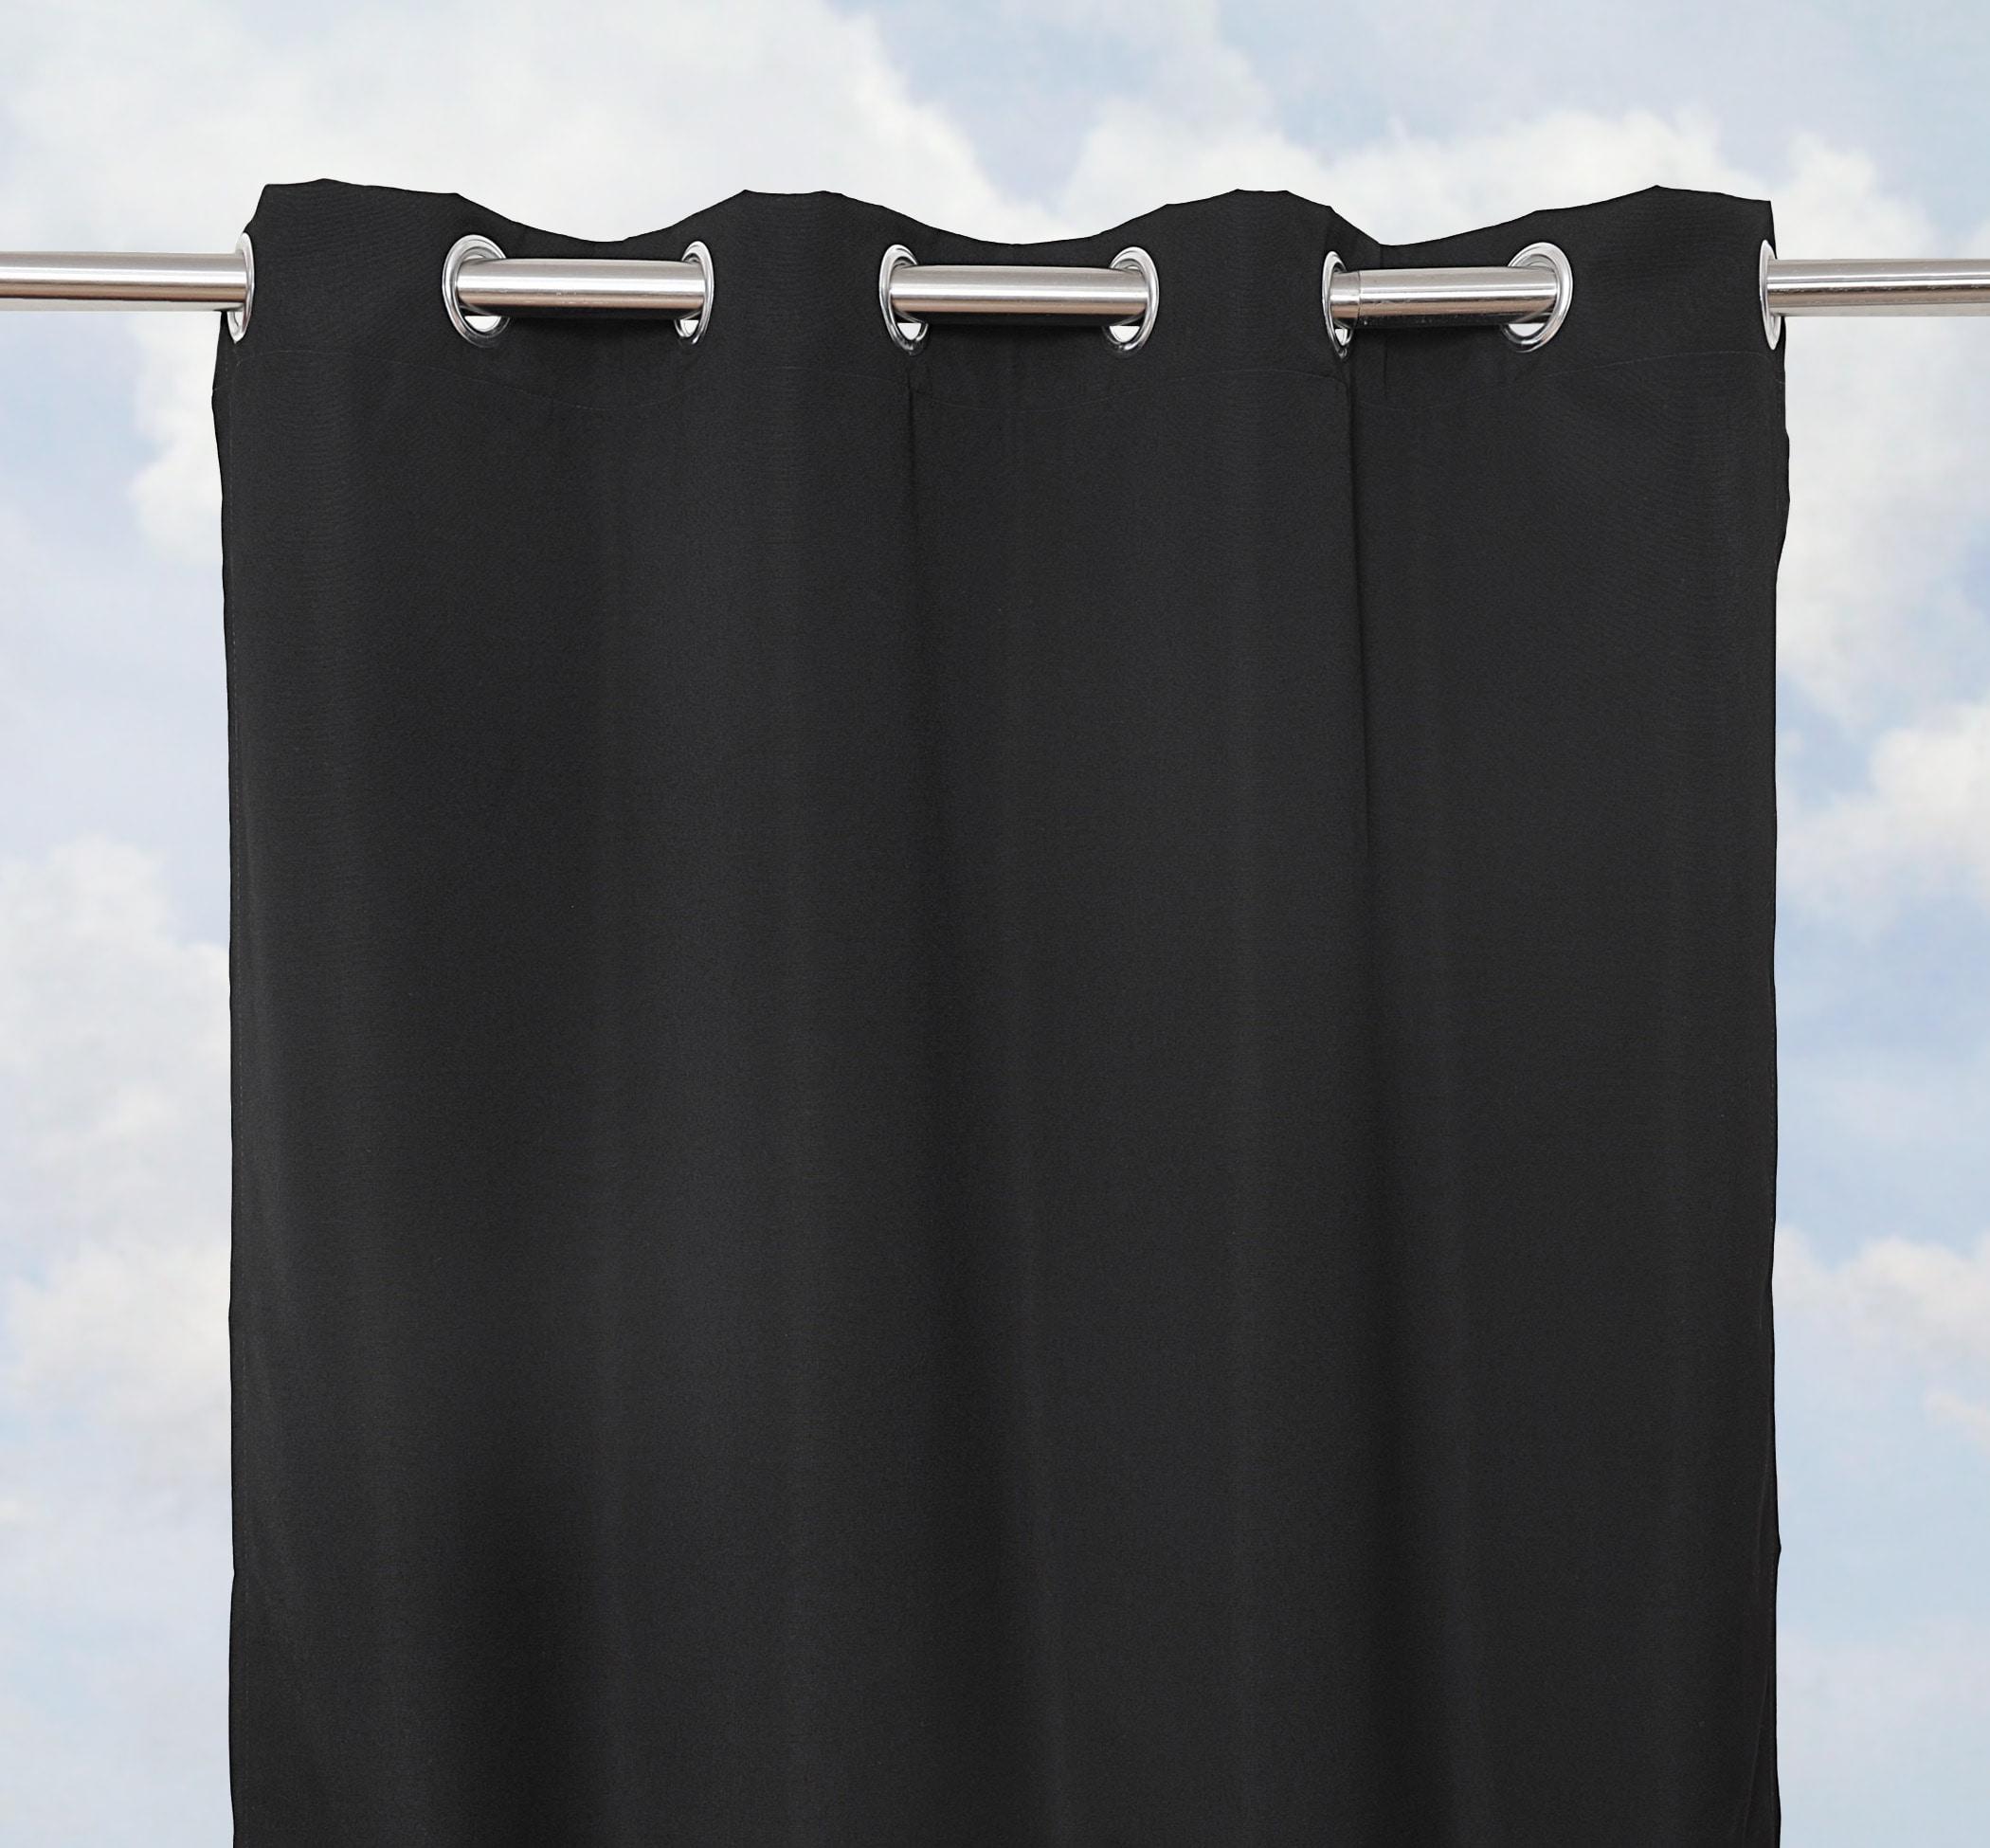 Sunbrella Bay View Black 96-inch Outdoor Curtain Panel